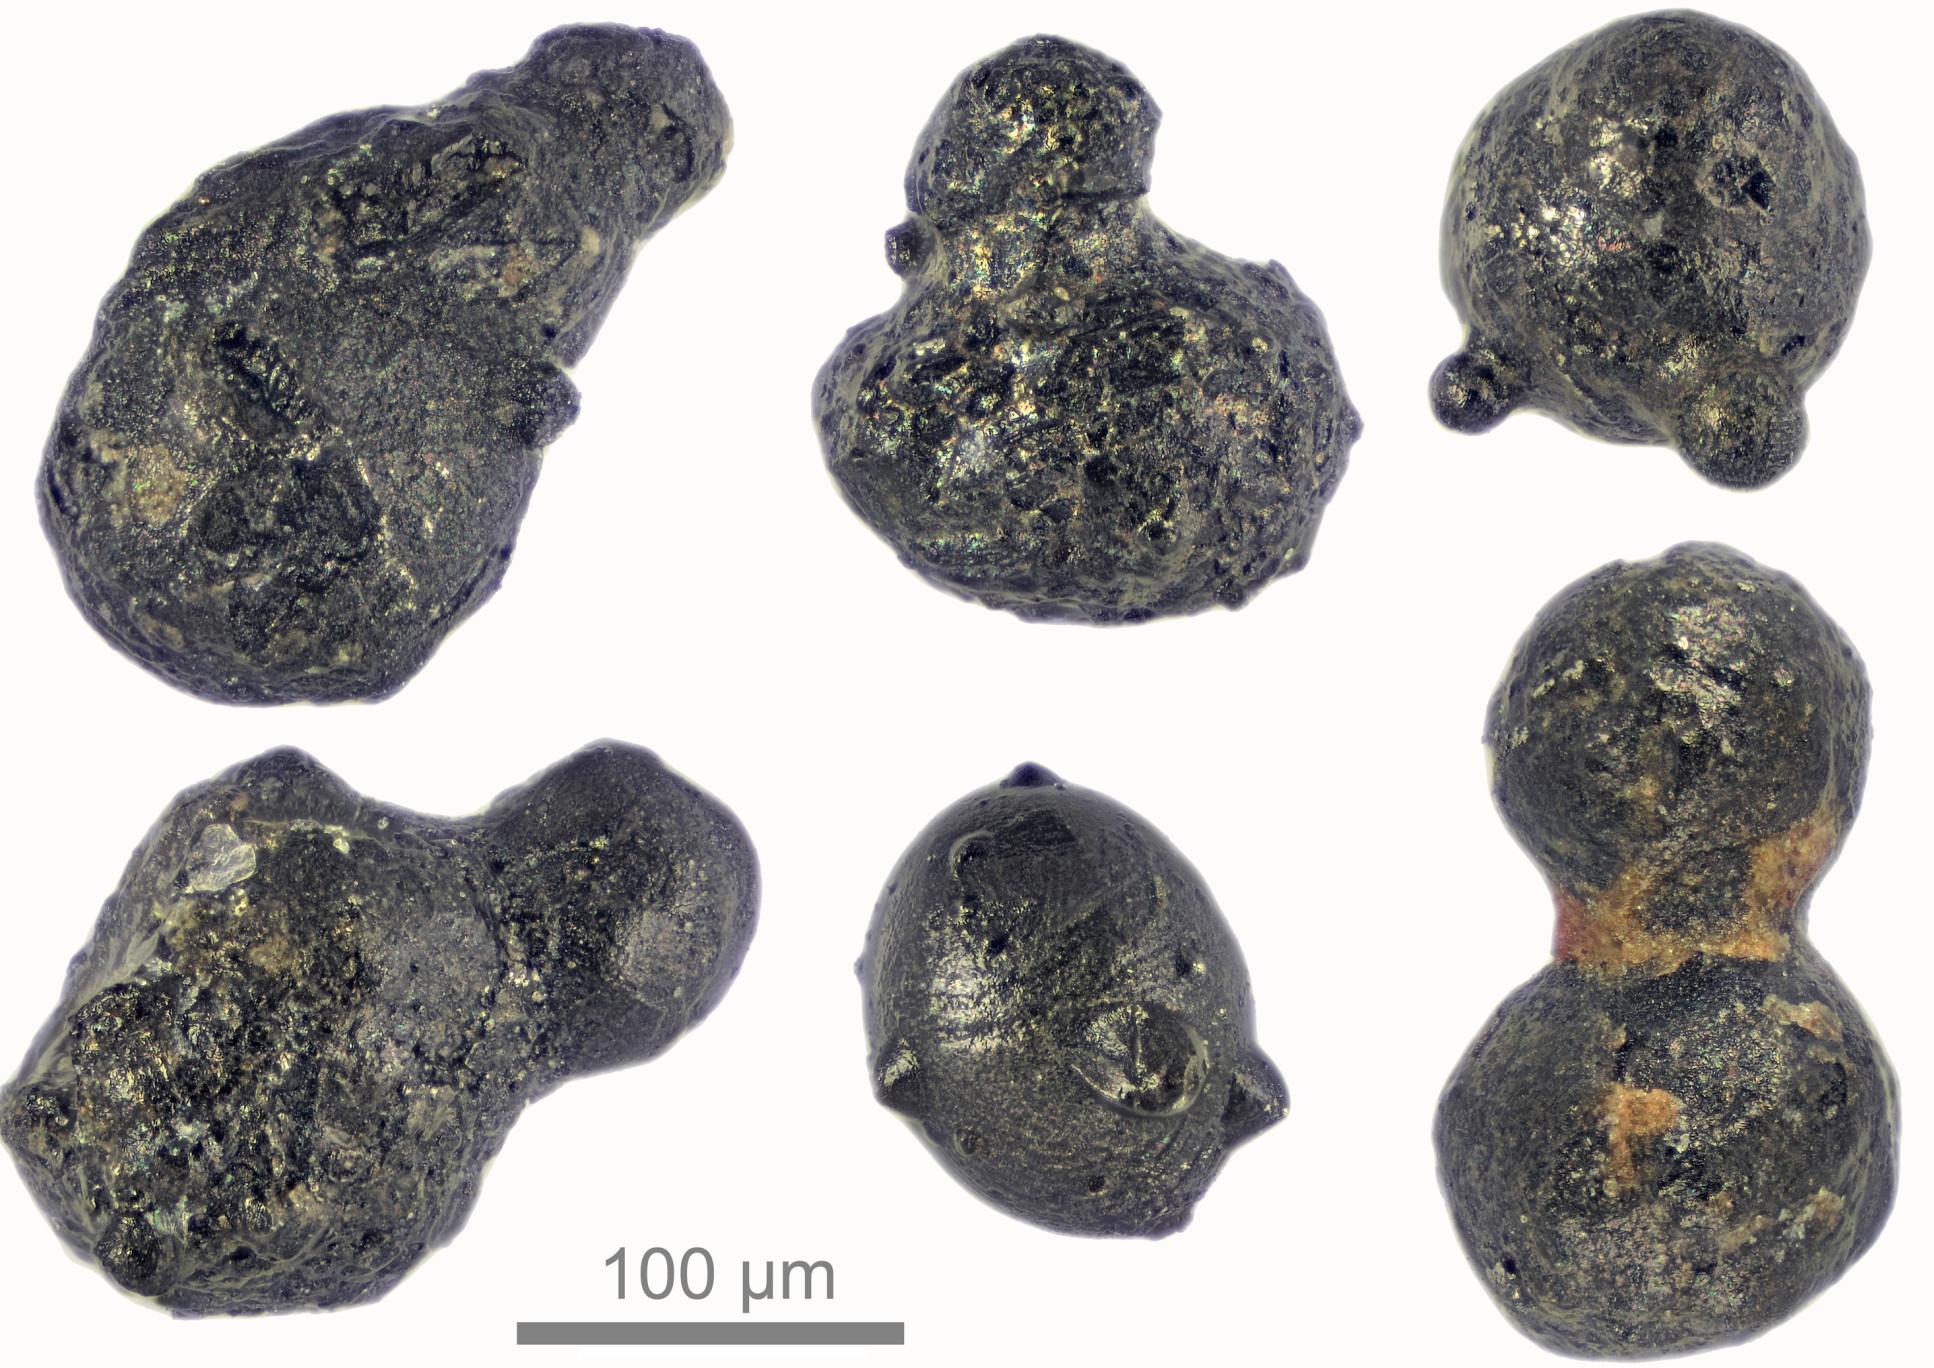 Photo of six micrometeorites up close, measuring around 200 micrometres across